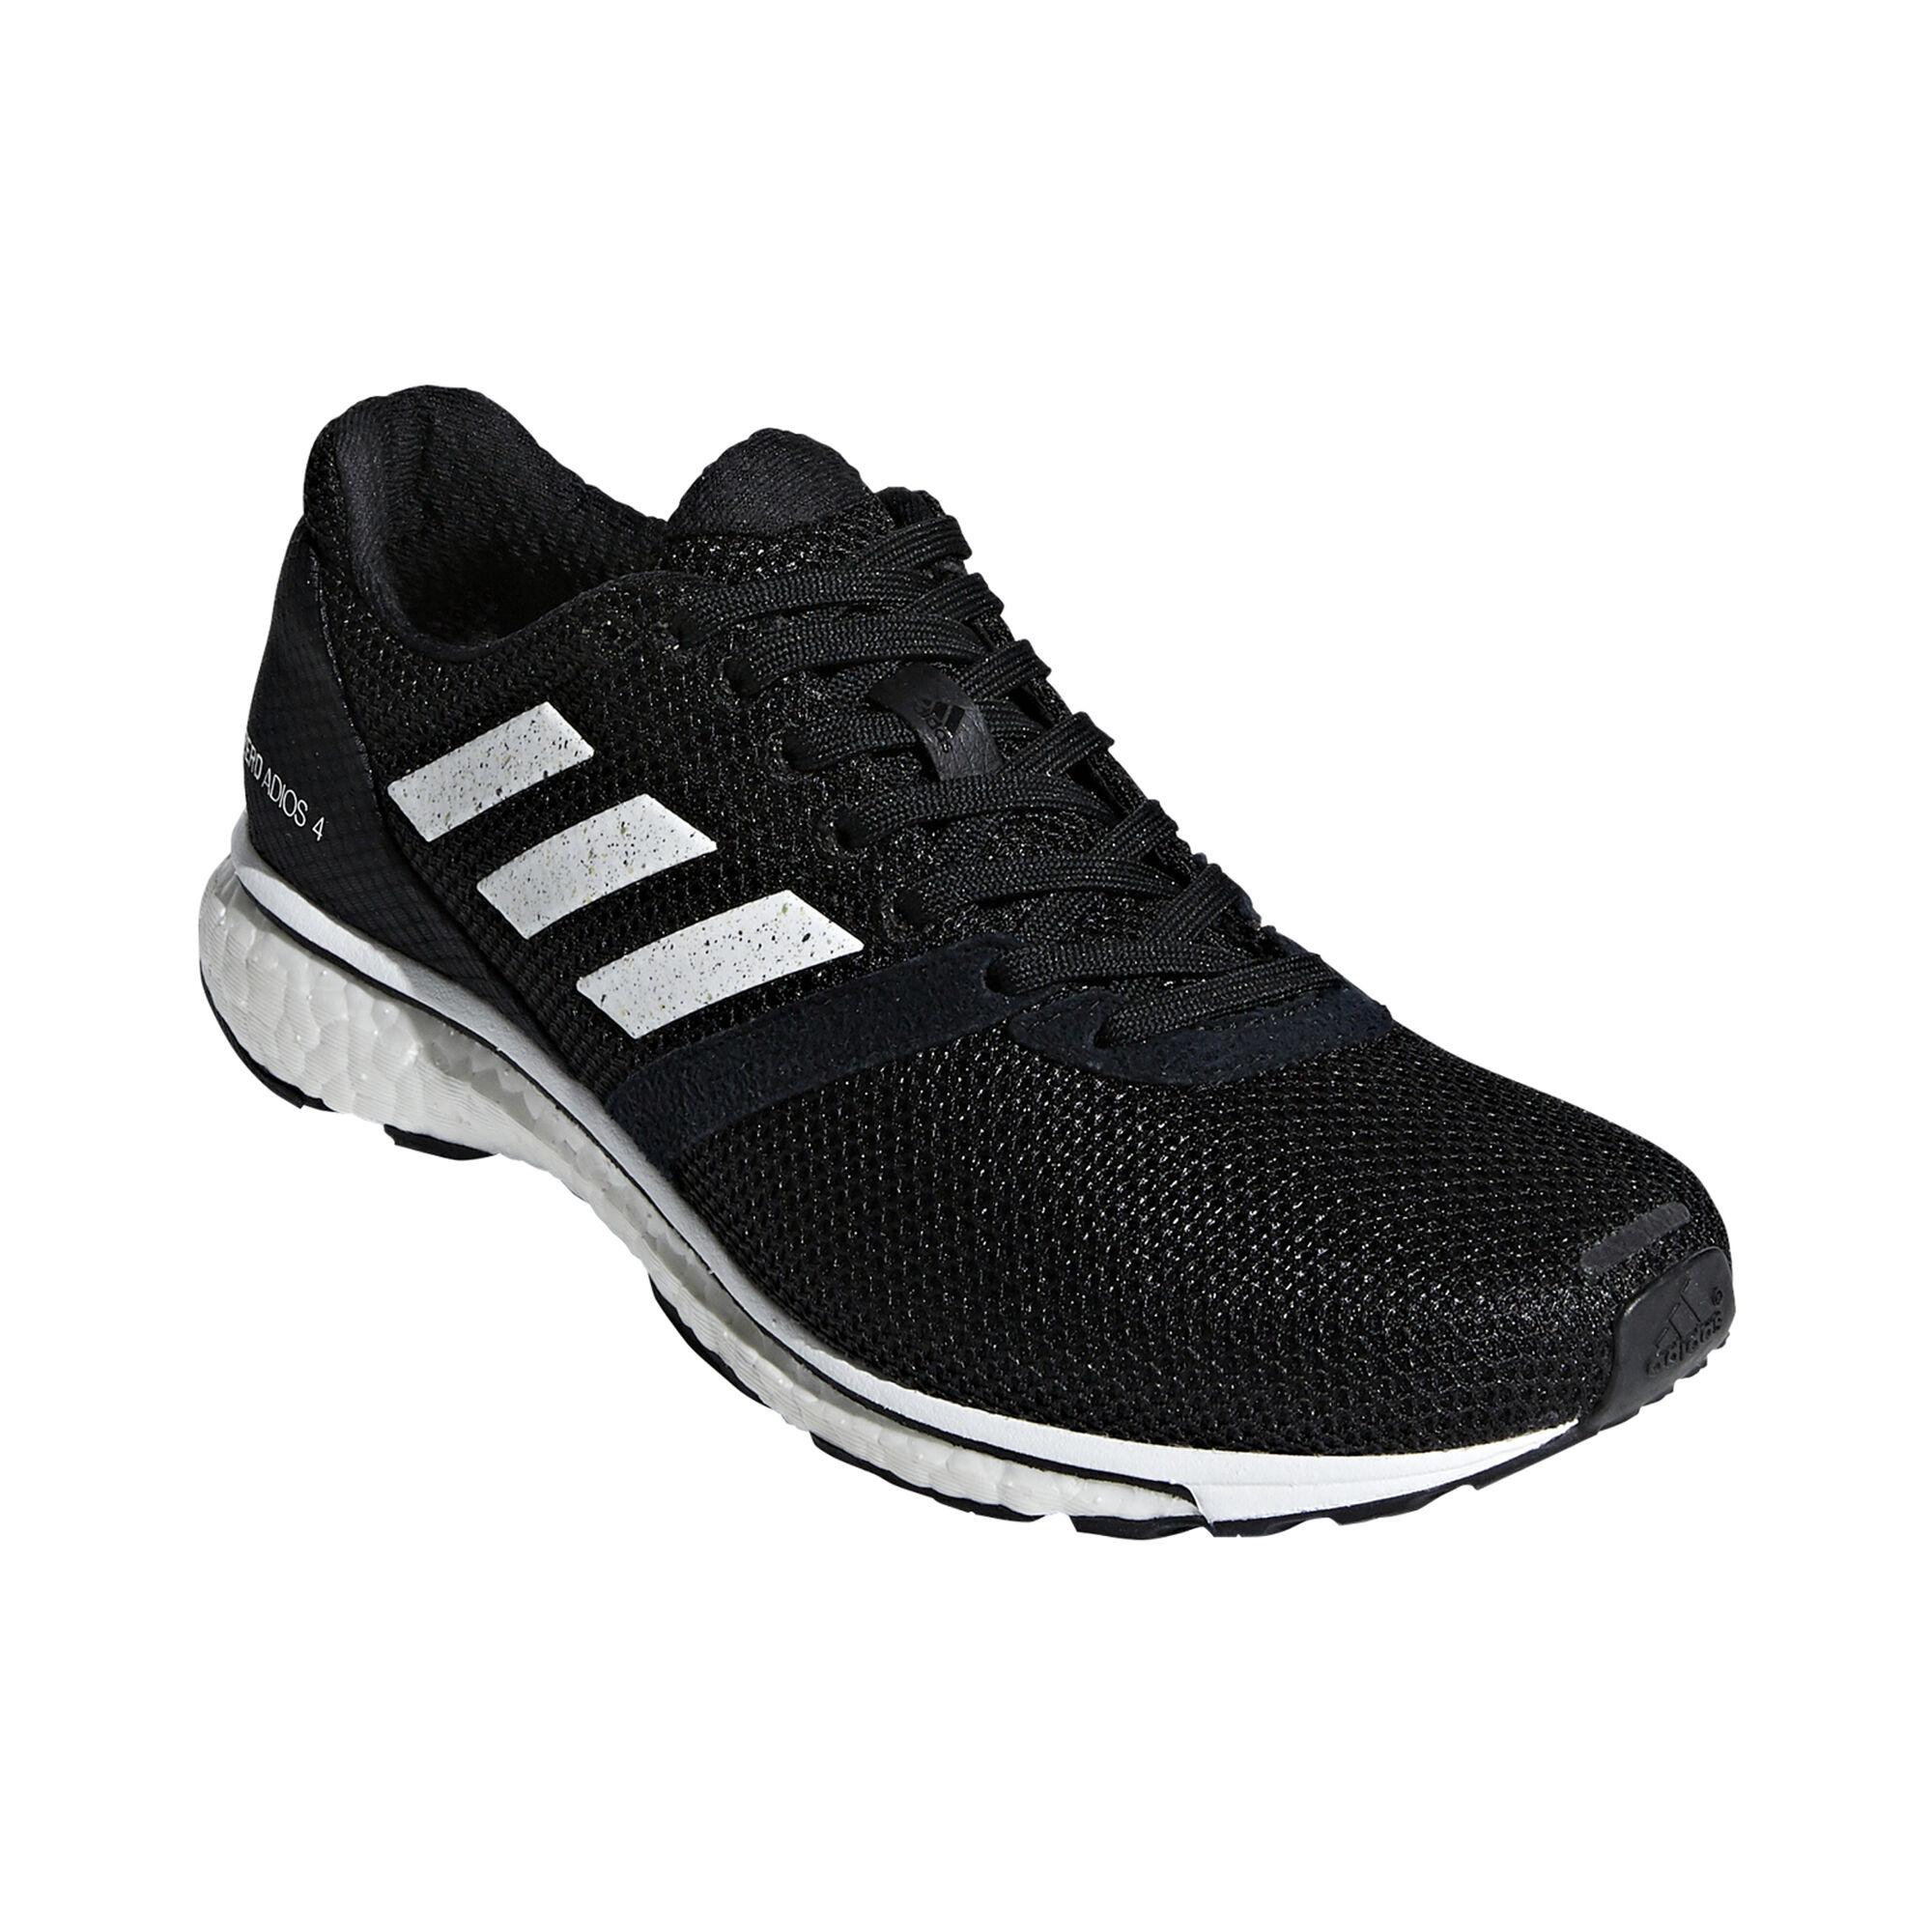 new style 9050f 0e1a3 buy adidas Adizero Adios 4 Competition Running Shoe Women - Black ...